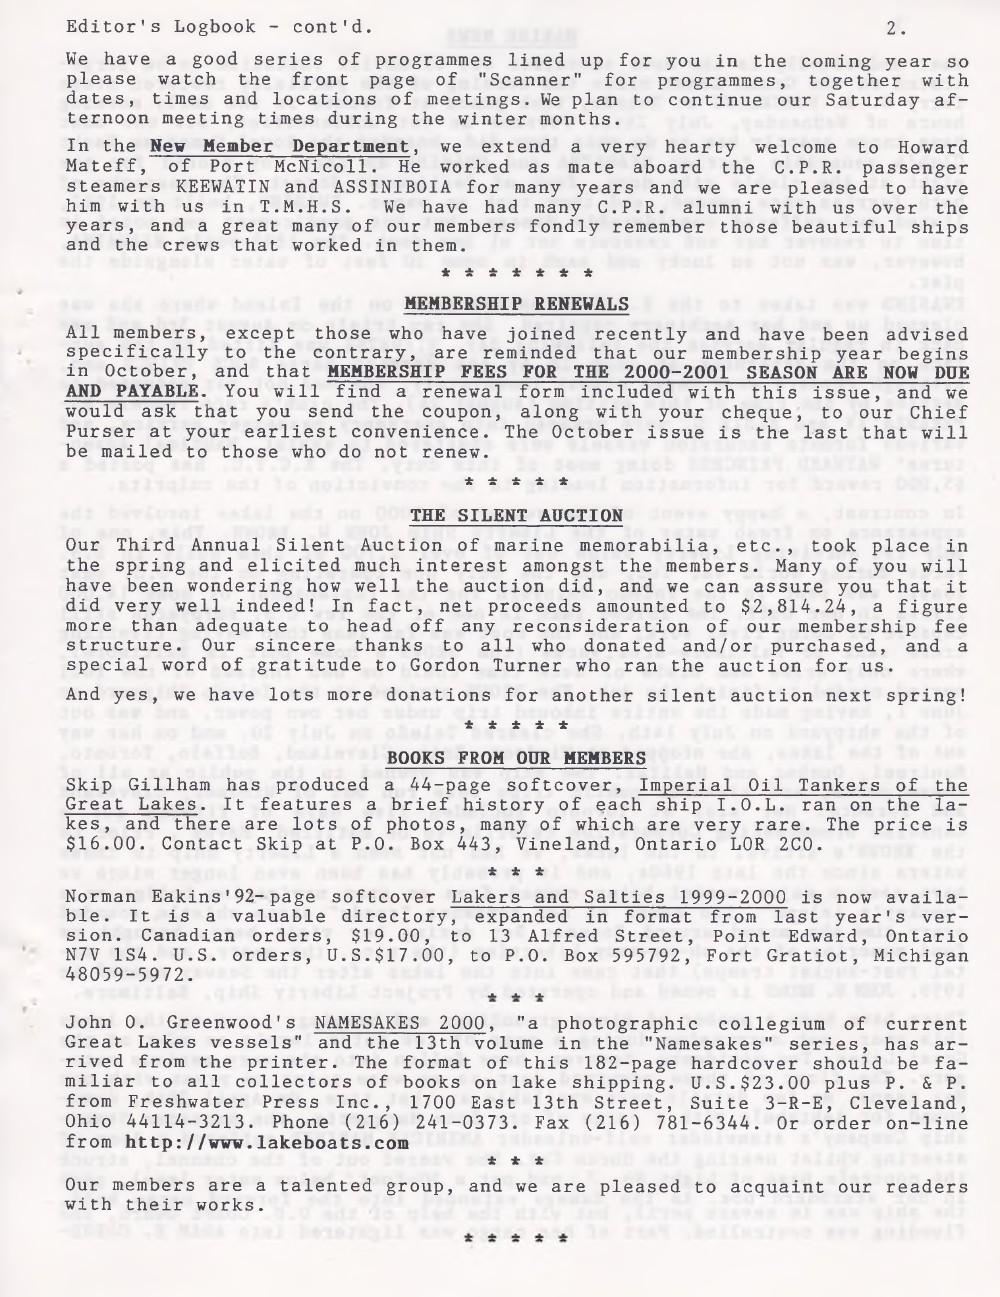 Scanner, v. 32, no. 9 (Mid-Summer 2000)